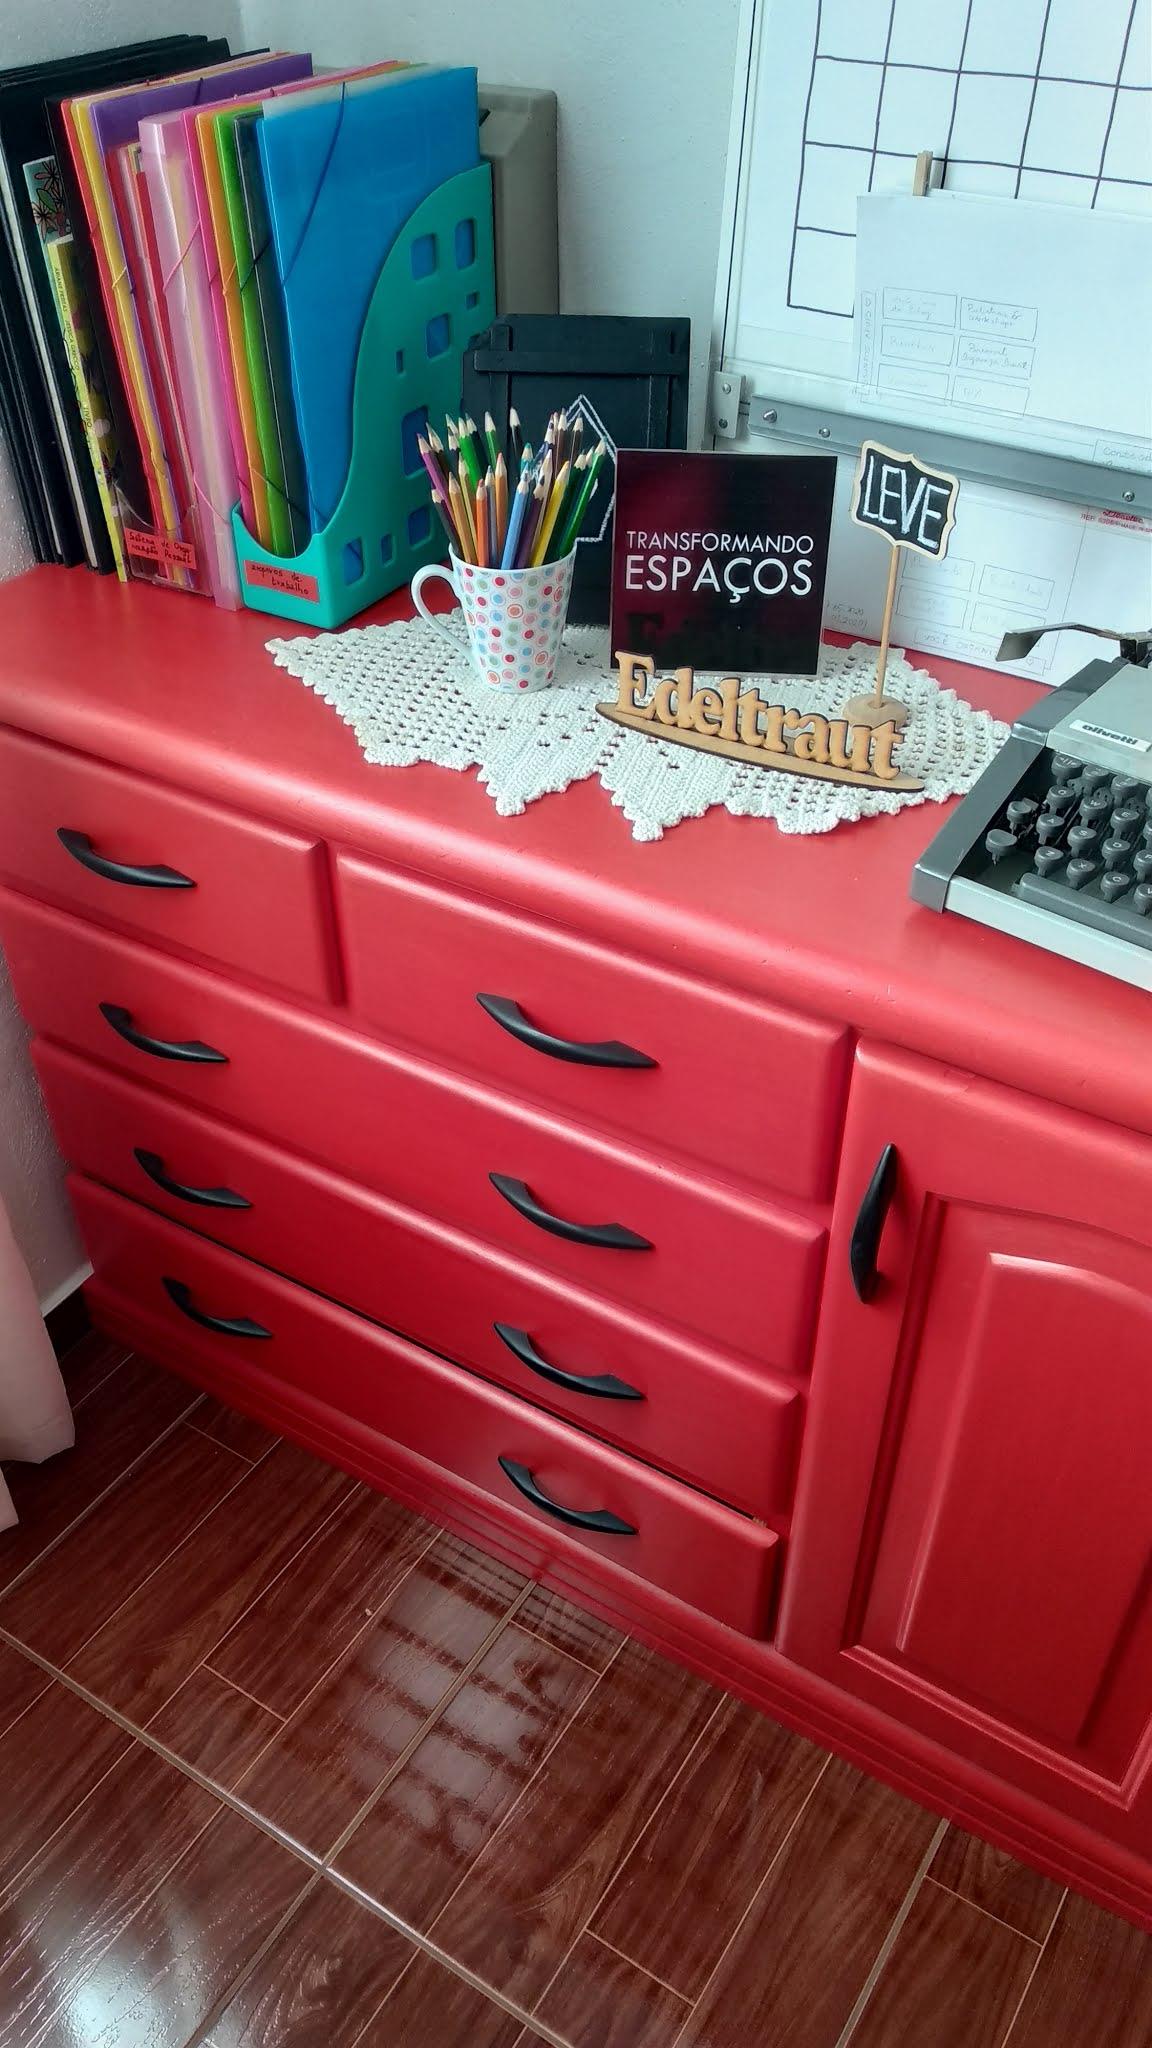 cômoda vermelha - lar organizado